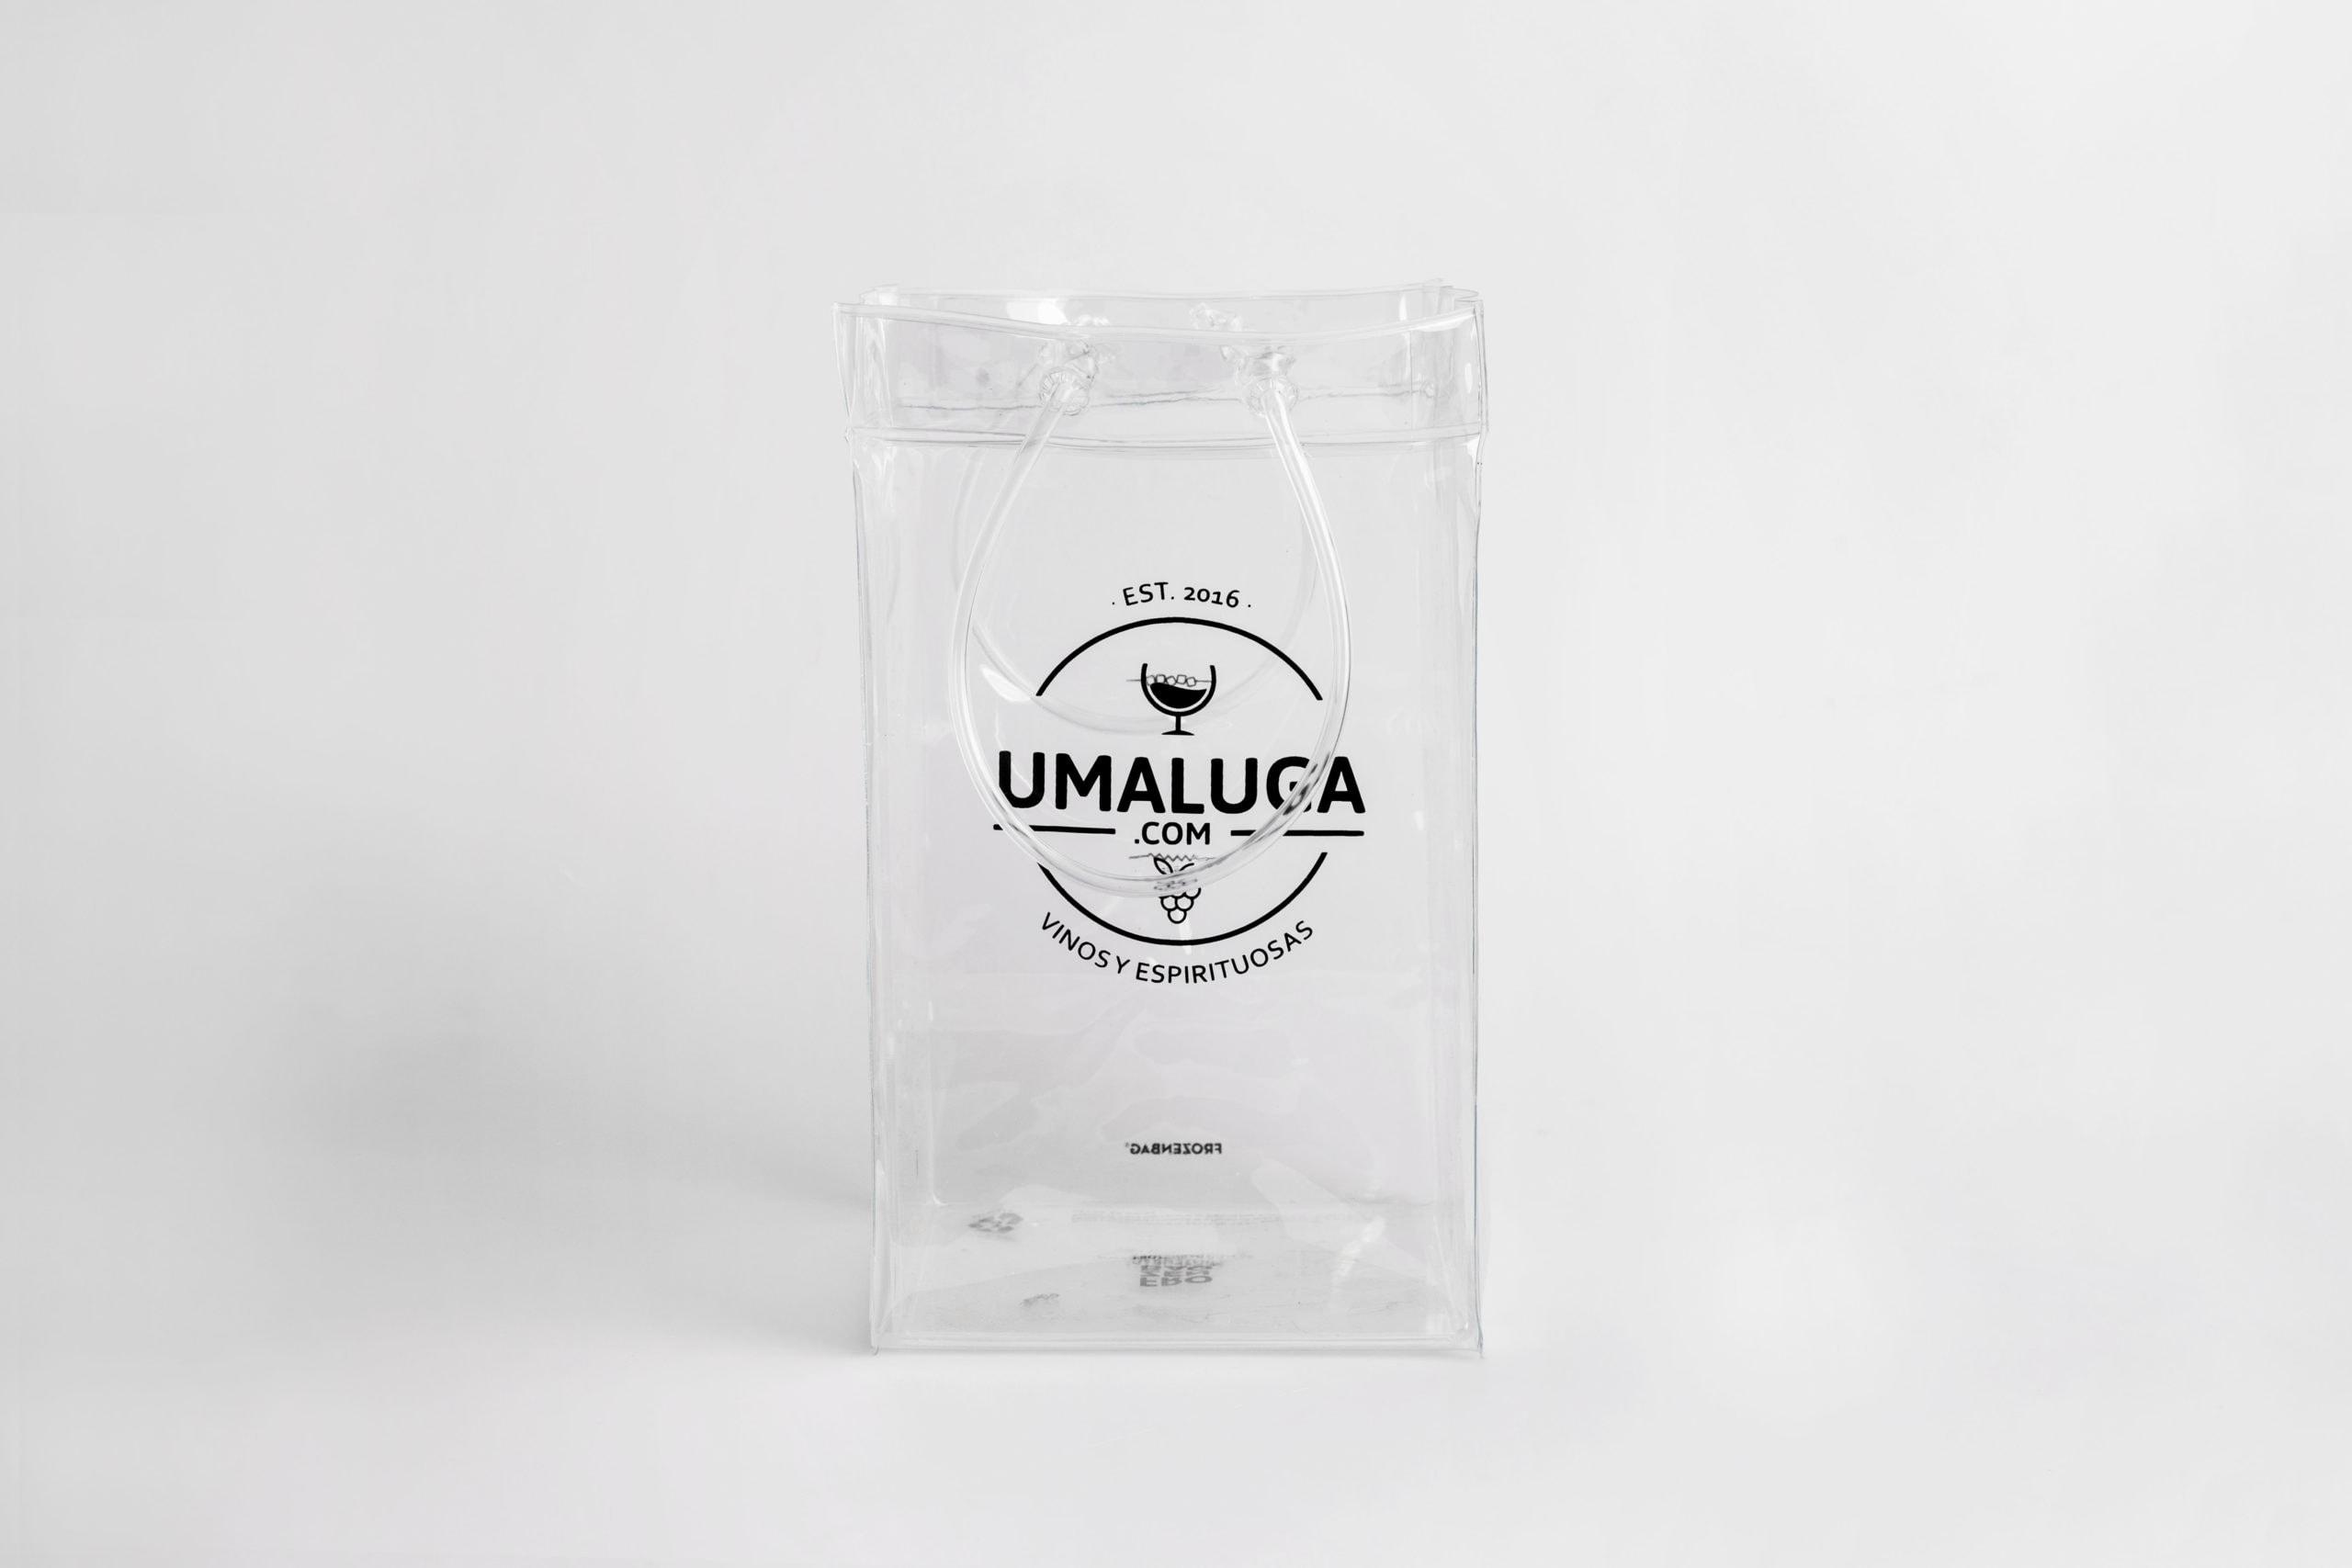 Umaluga XL Crystal Frente